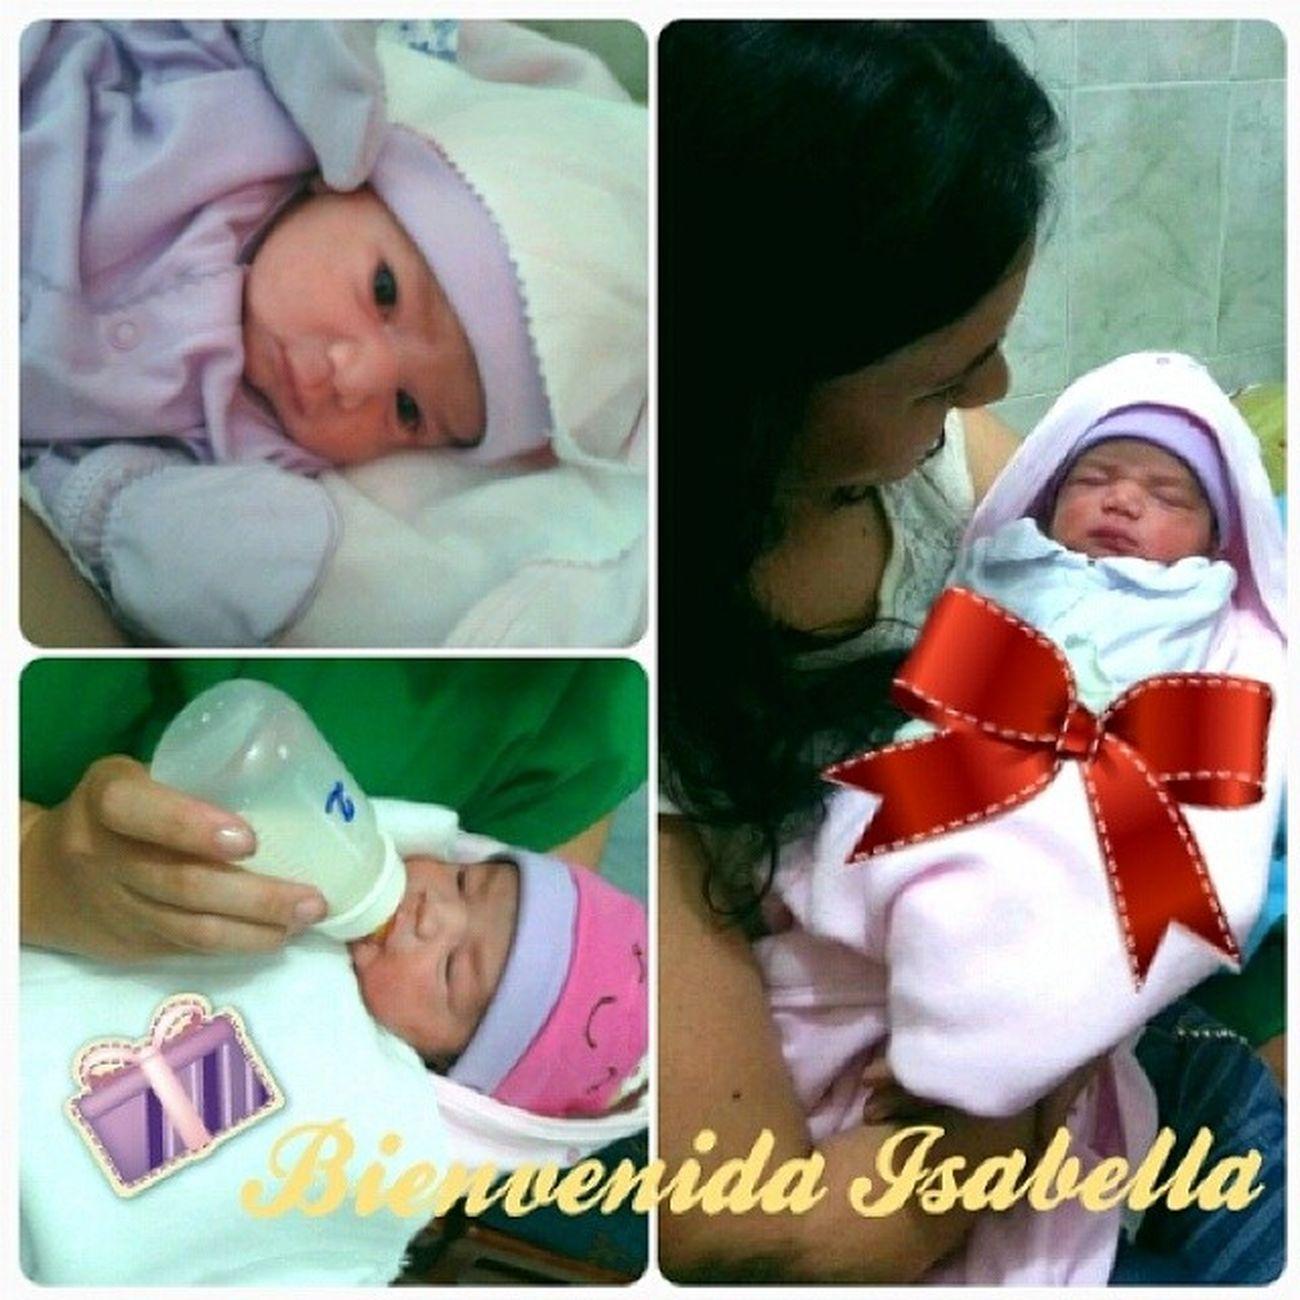 Isabella  Sobrinamia Chocheratotal Hermanitaparaamelia